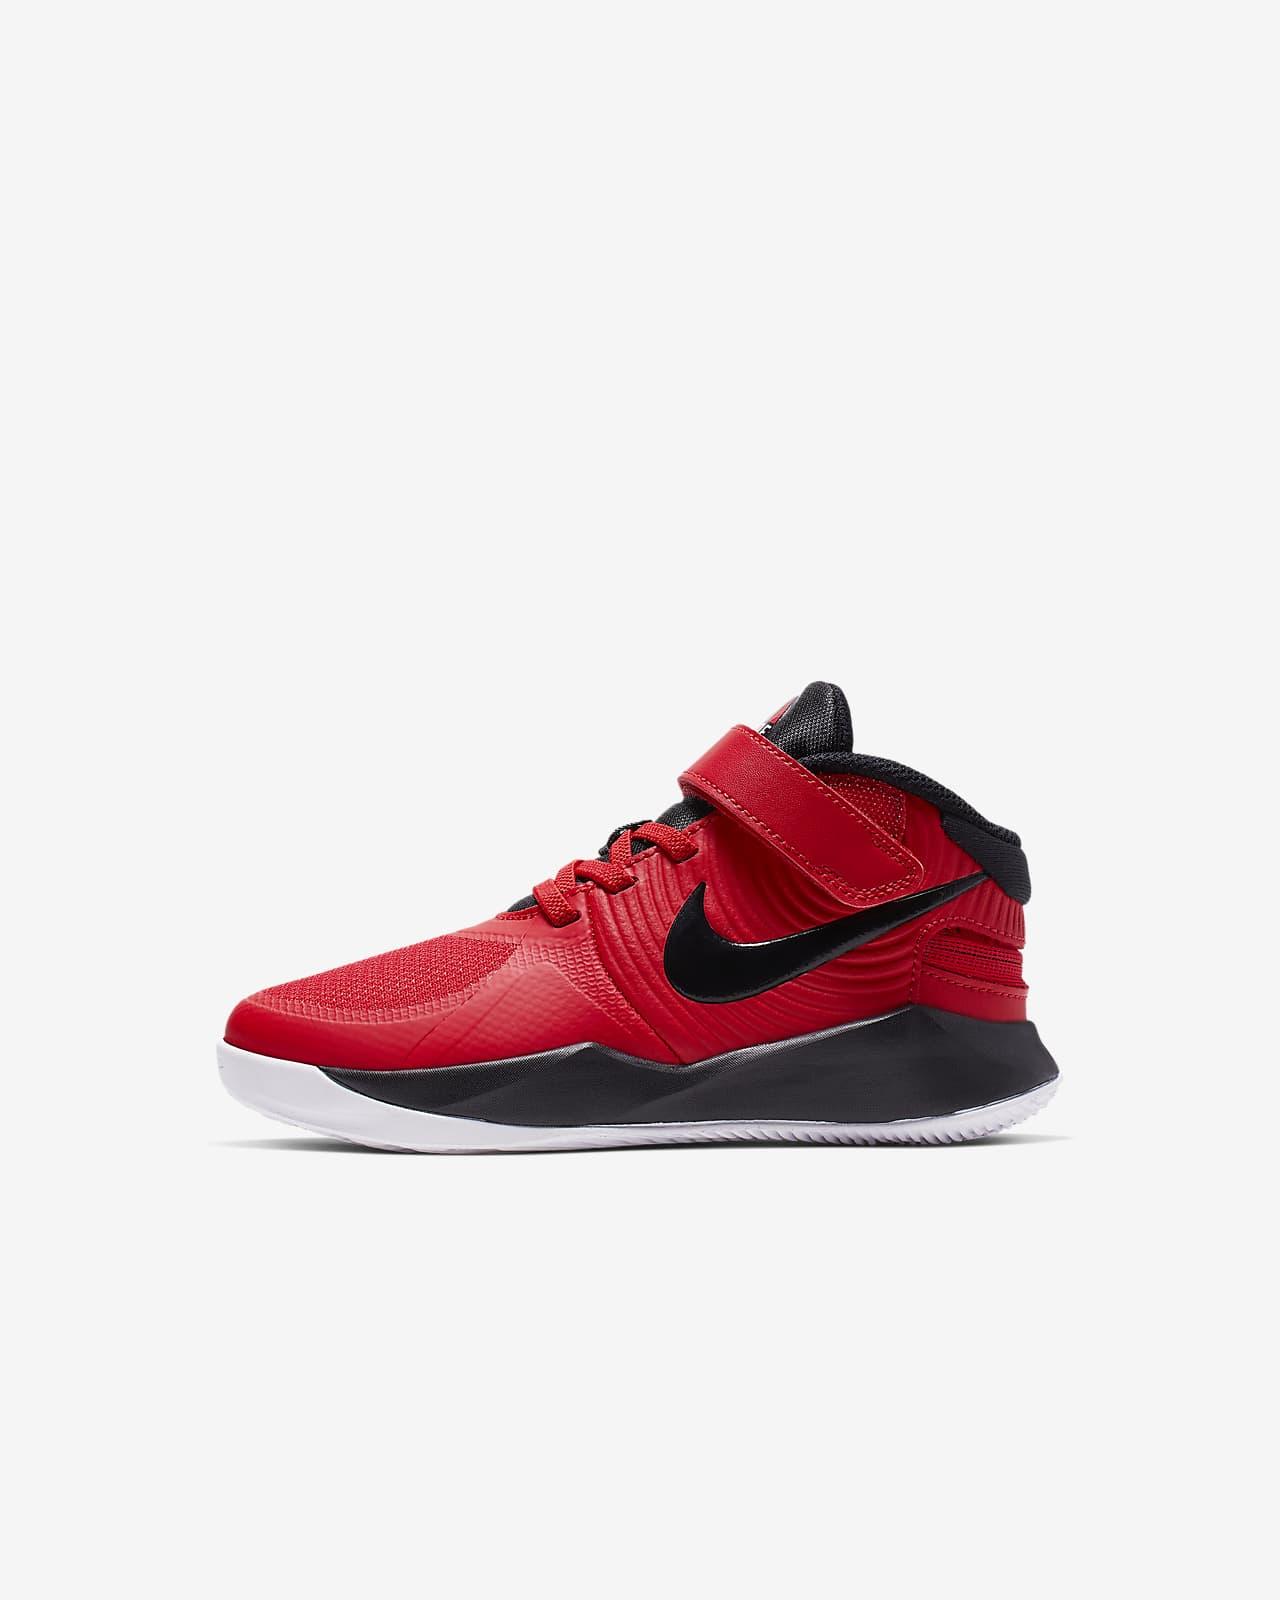 Nike Team Hustle D 9 FlyEase Younger Kids' Shoe